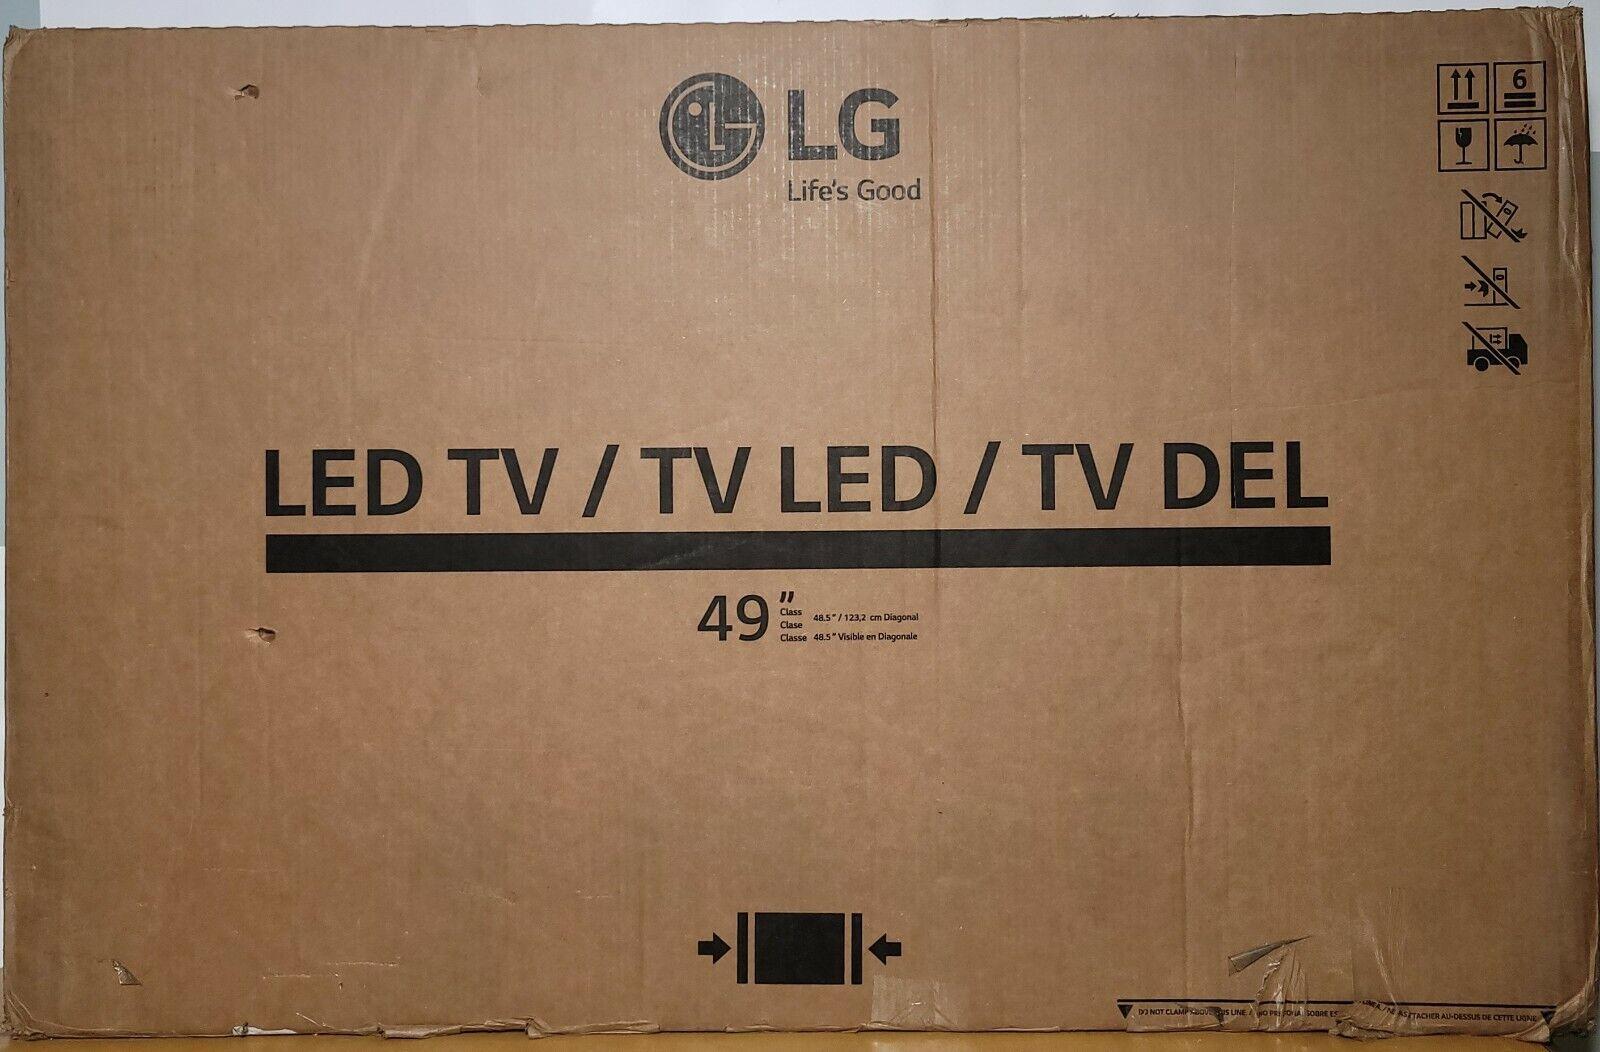 LG 49-inch Diagonal Class UT577H LED-backlit LCD Display - Factory Sealed